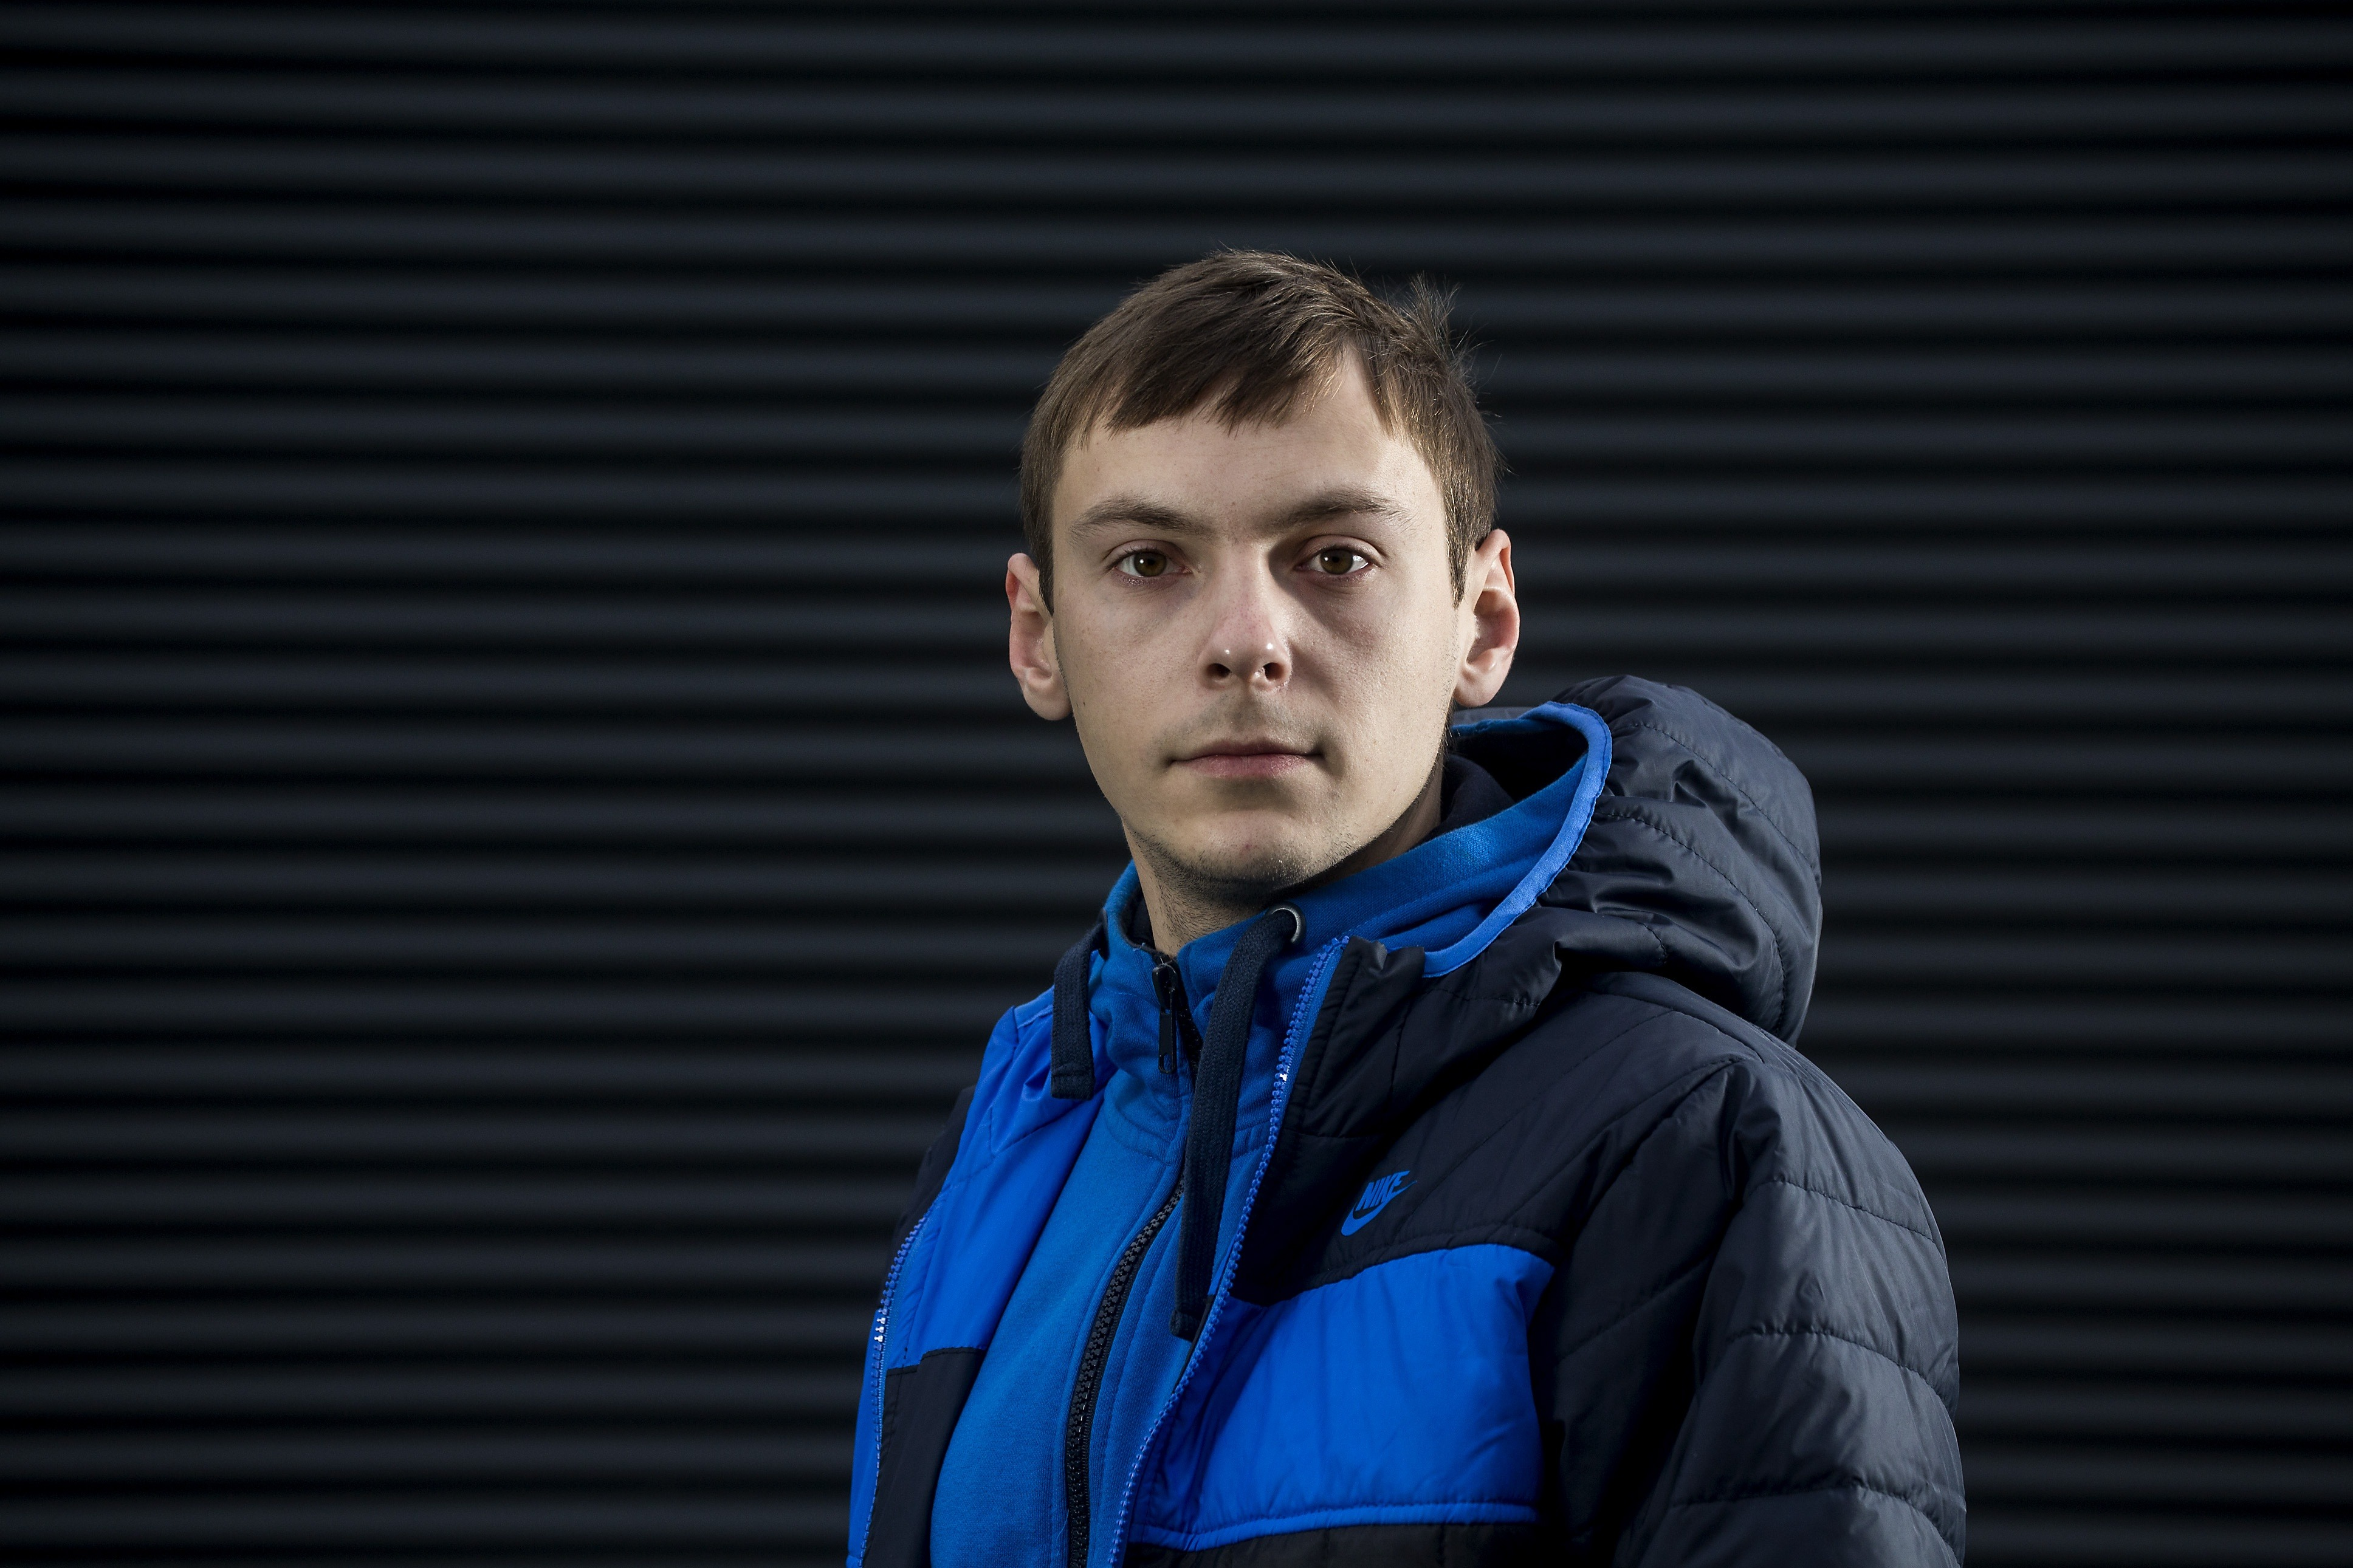 26-årige Oleksii Naboka fra Ukraine blev snydt for knap 278.000 kroner i løn og feriepenge som fodermester hos en dansk landmand.